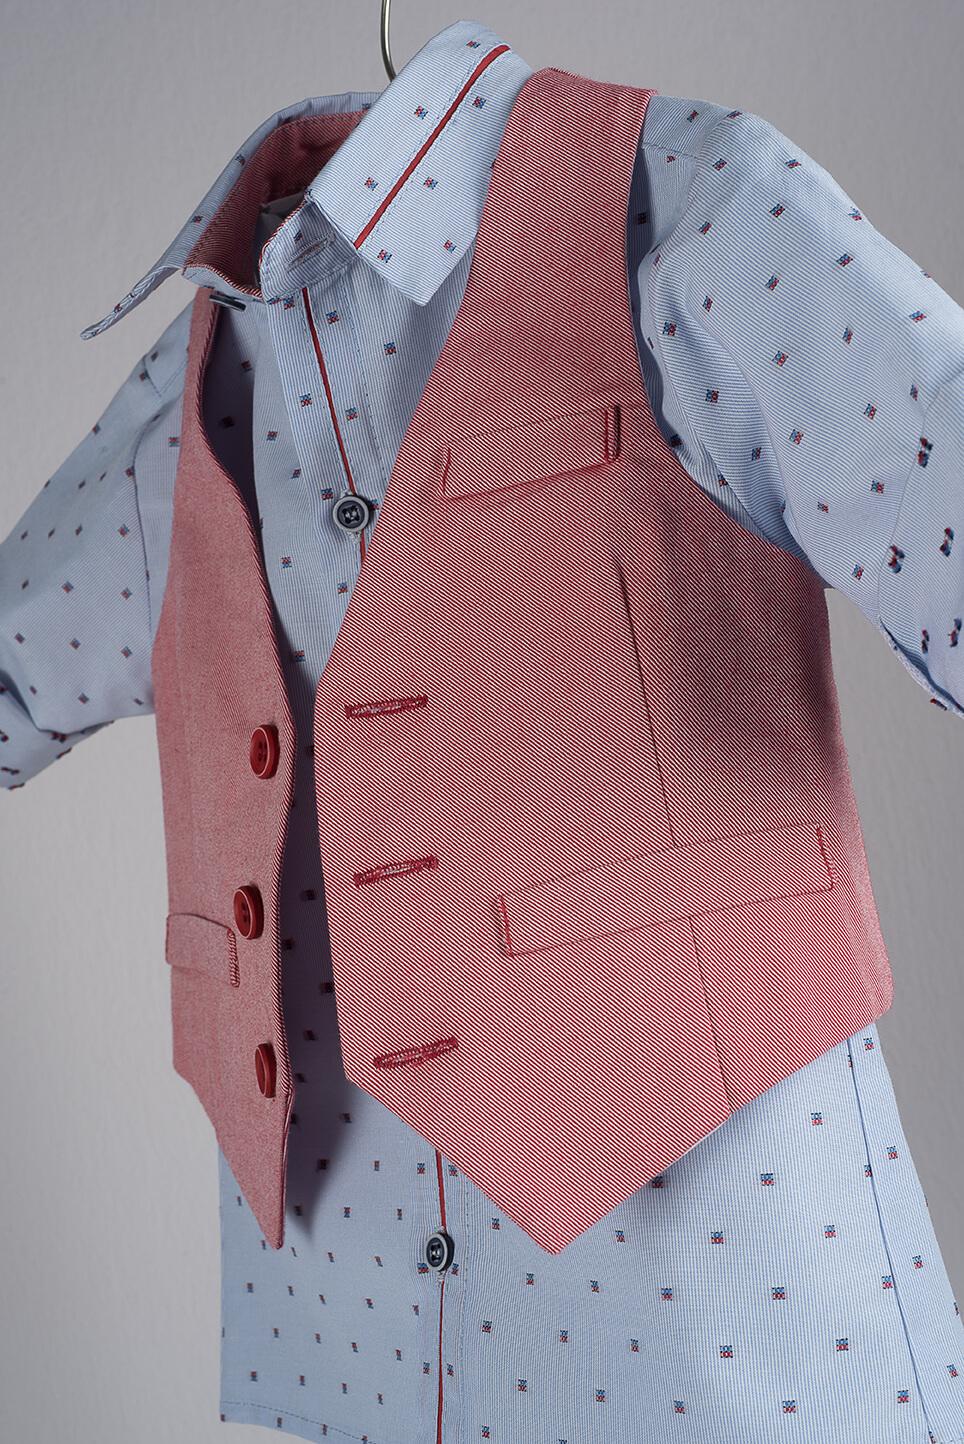 Shirt design blue cotton - Light Blue Cotton Shirt With Micro Design